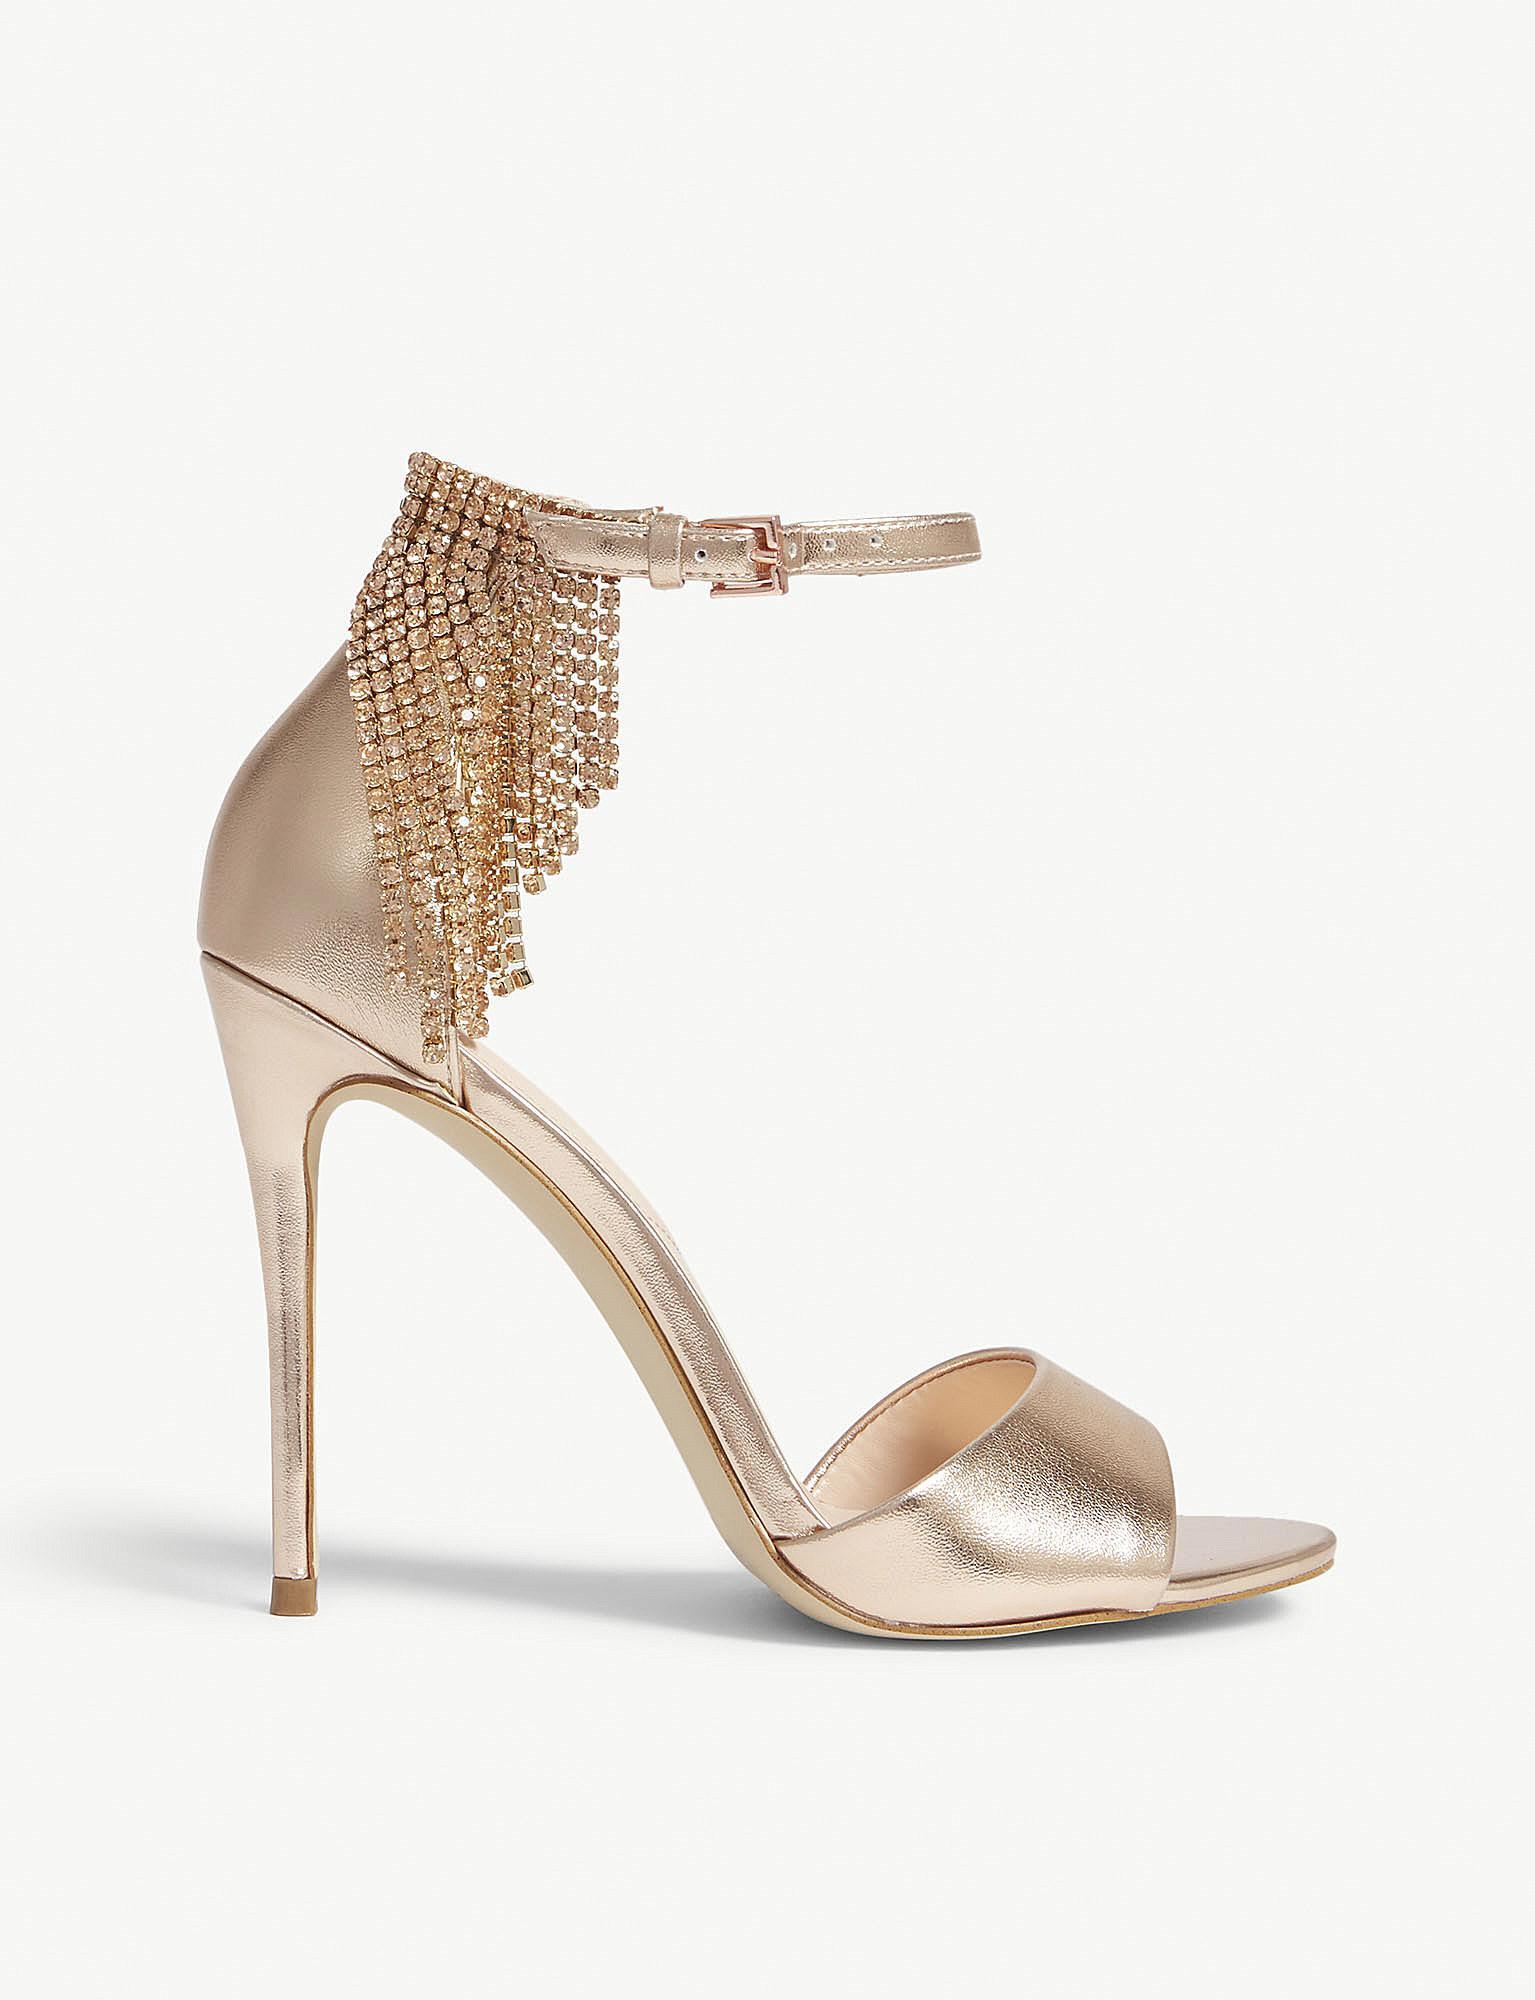 3e5ec6bae6a Lyst aldo batavia rhinestone ankle strap sandals in metallic jpg 1535x2000  Aldo clear sandals